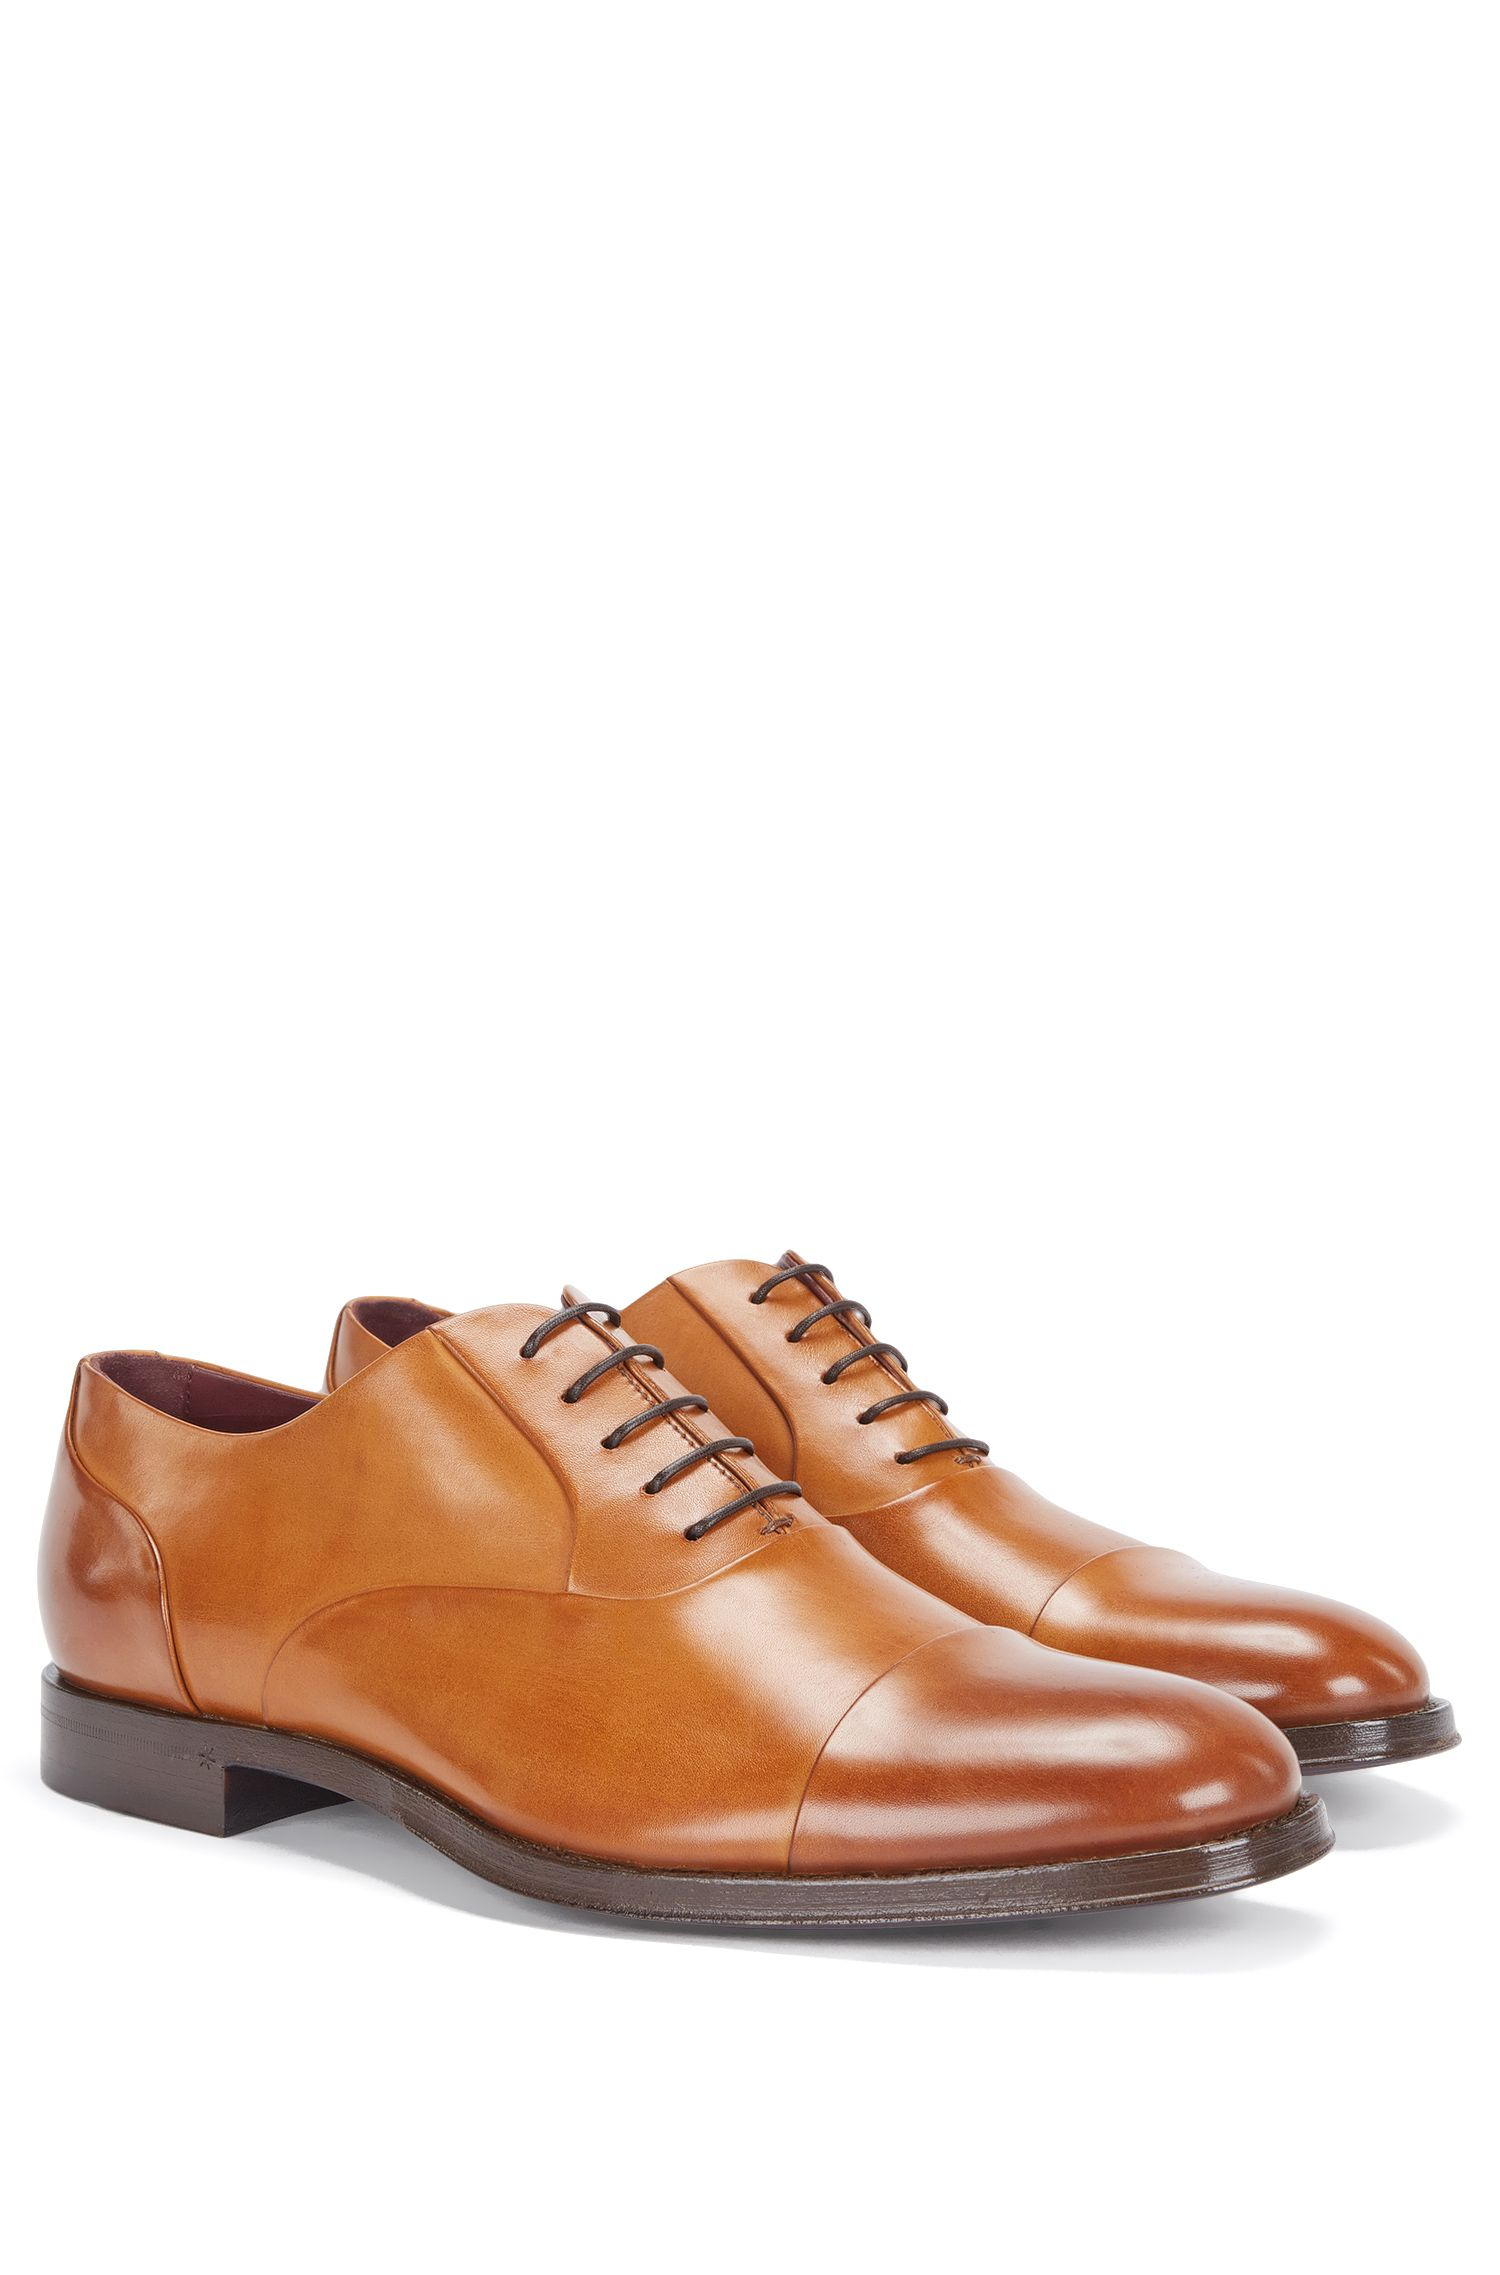 'T-Sartoria Oxfr ltct' | Italian Calfskin Oxford Dress Shoes